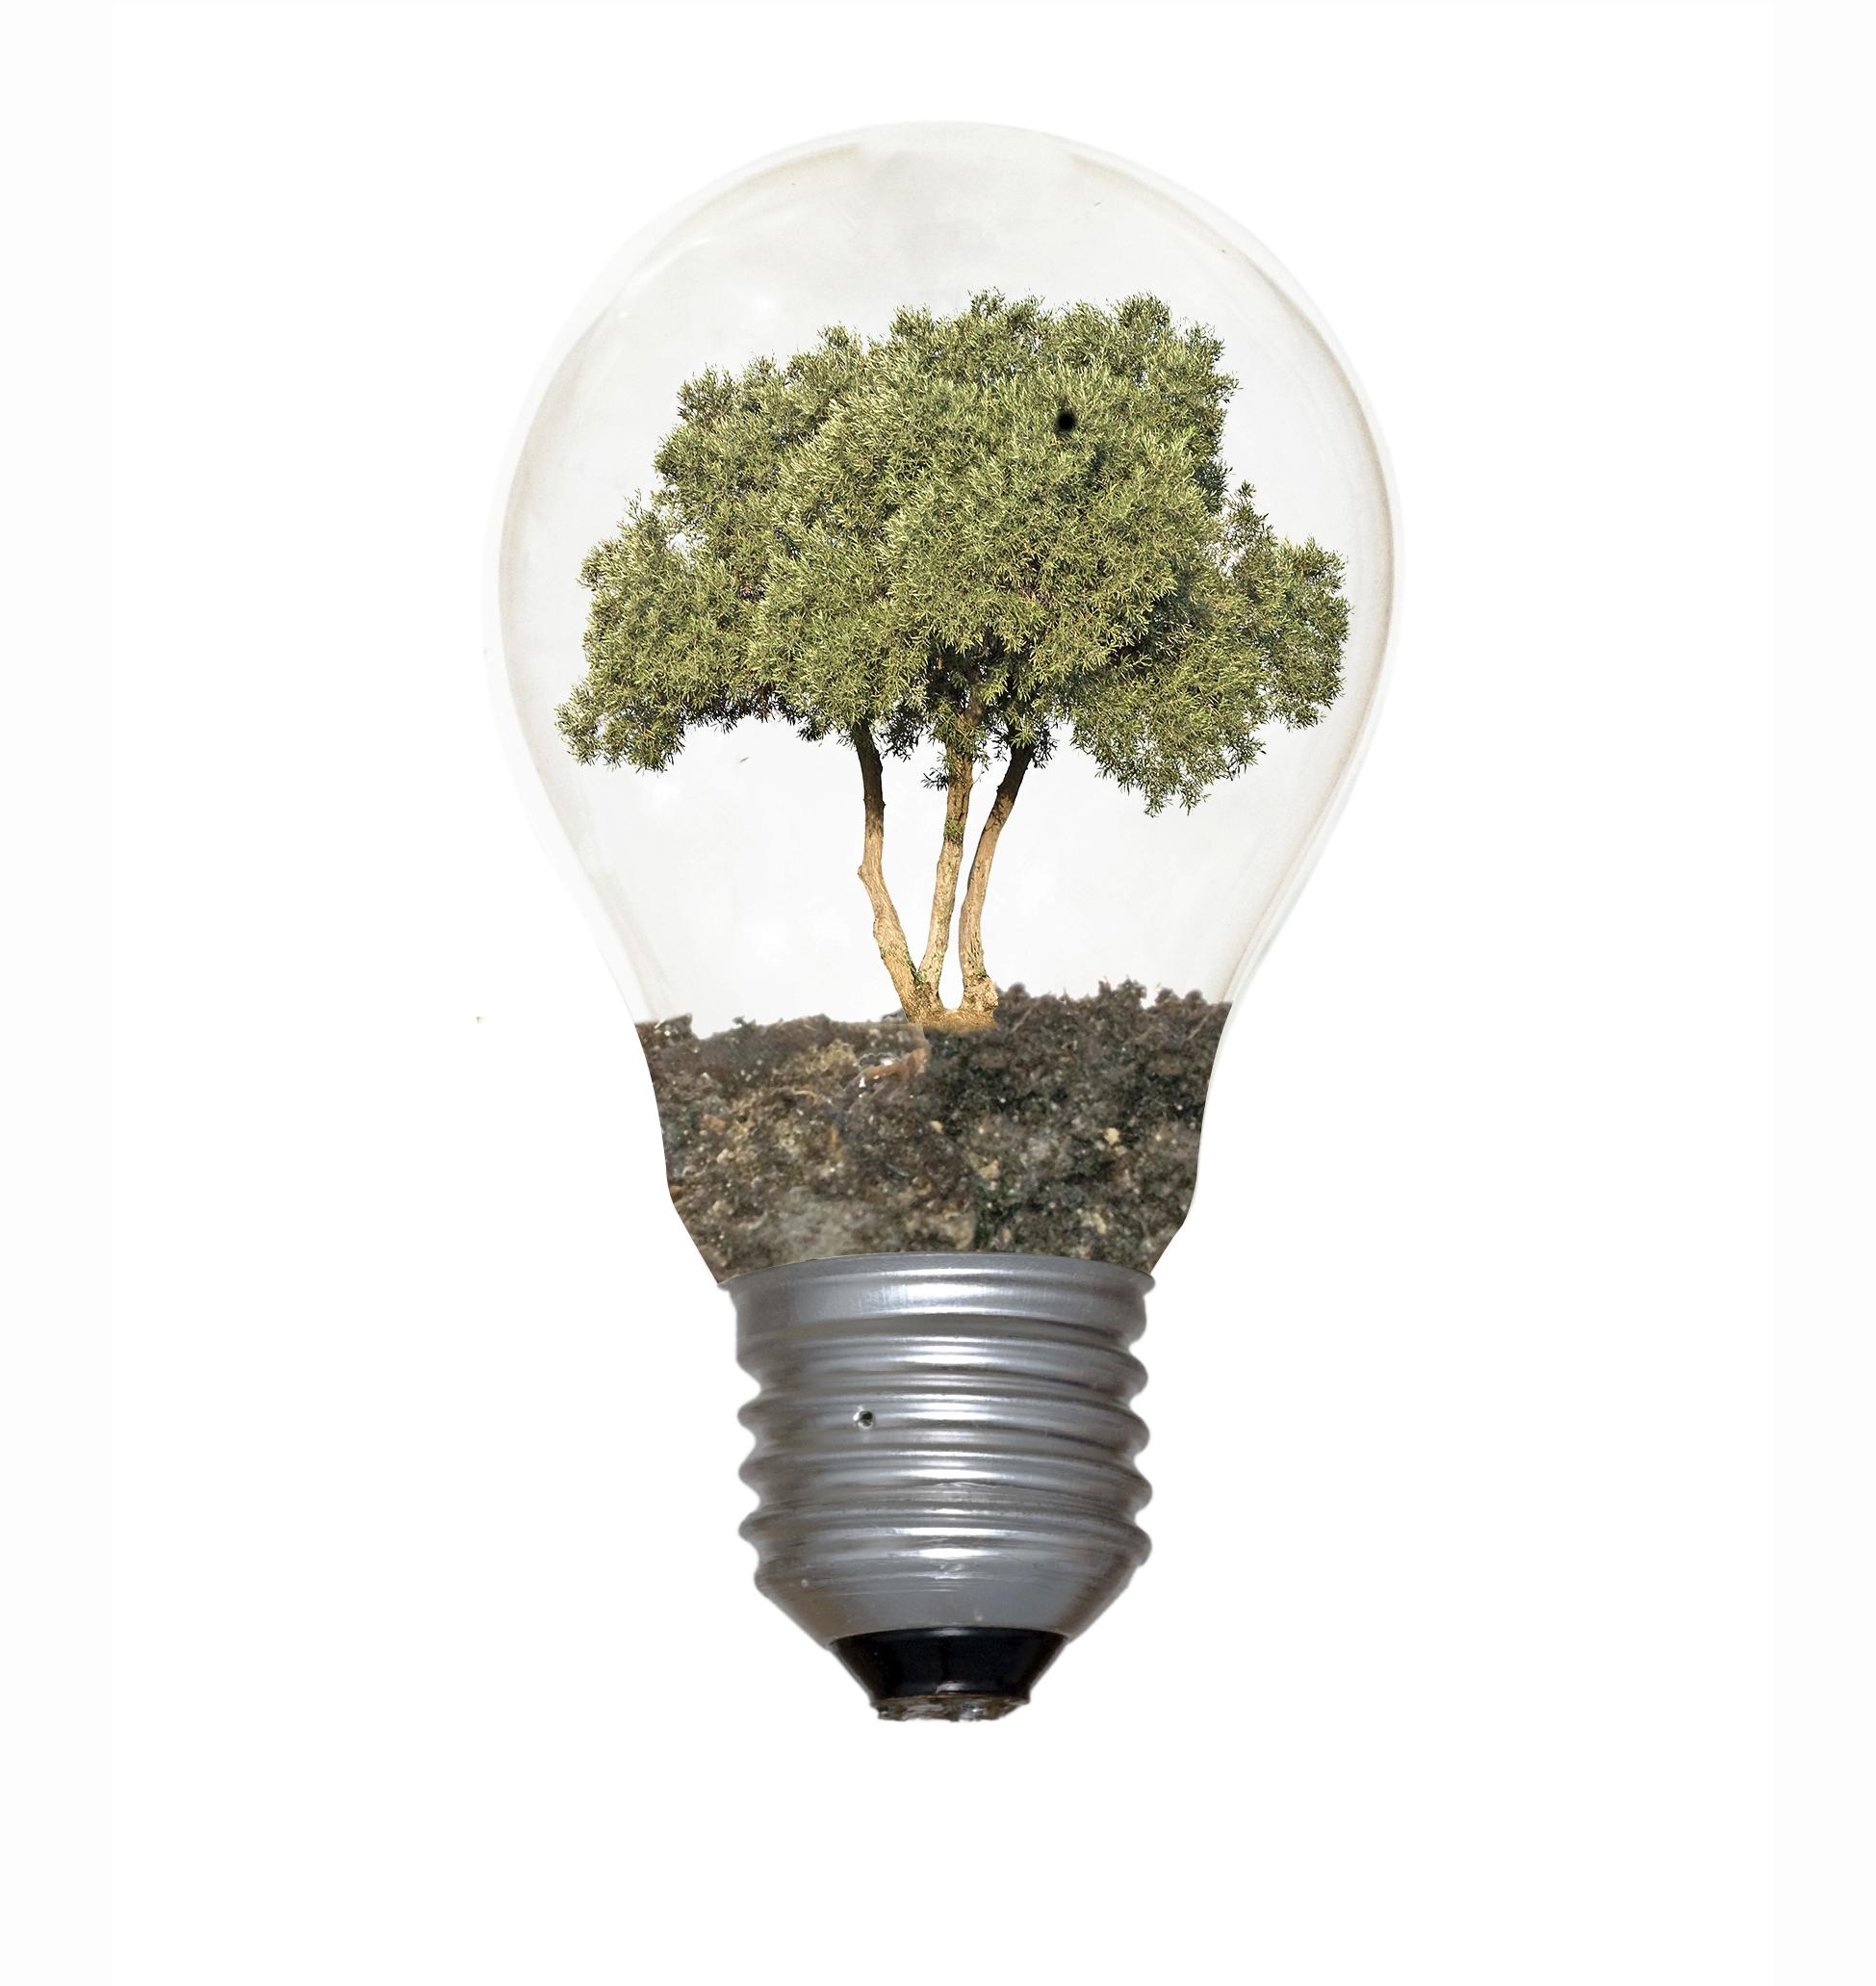 organic fertilizer products